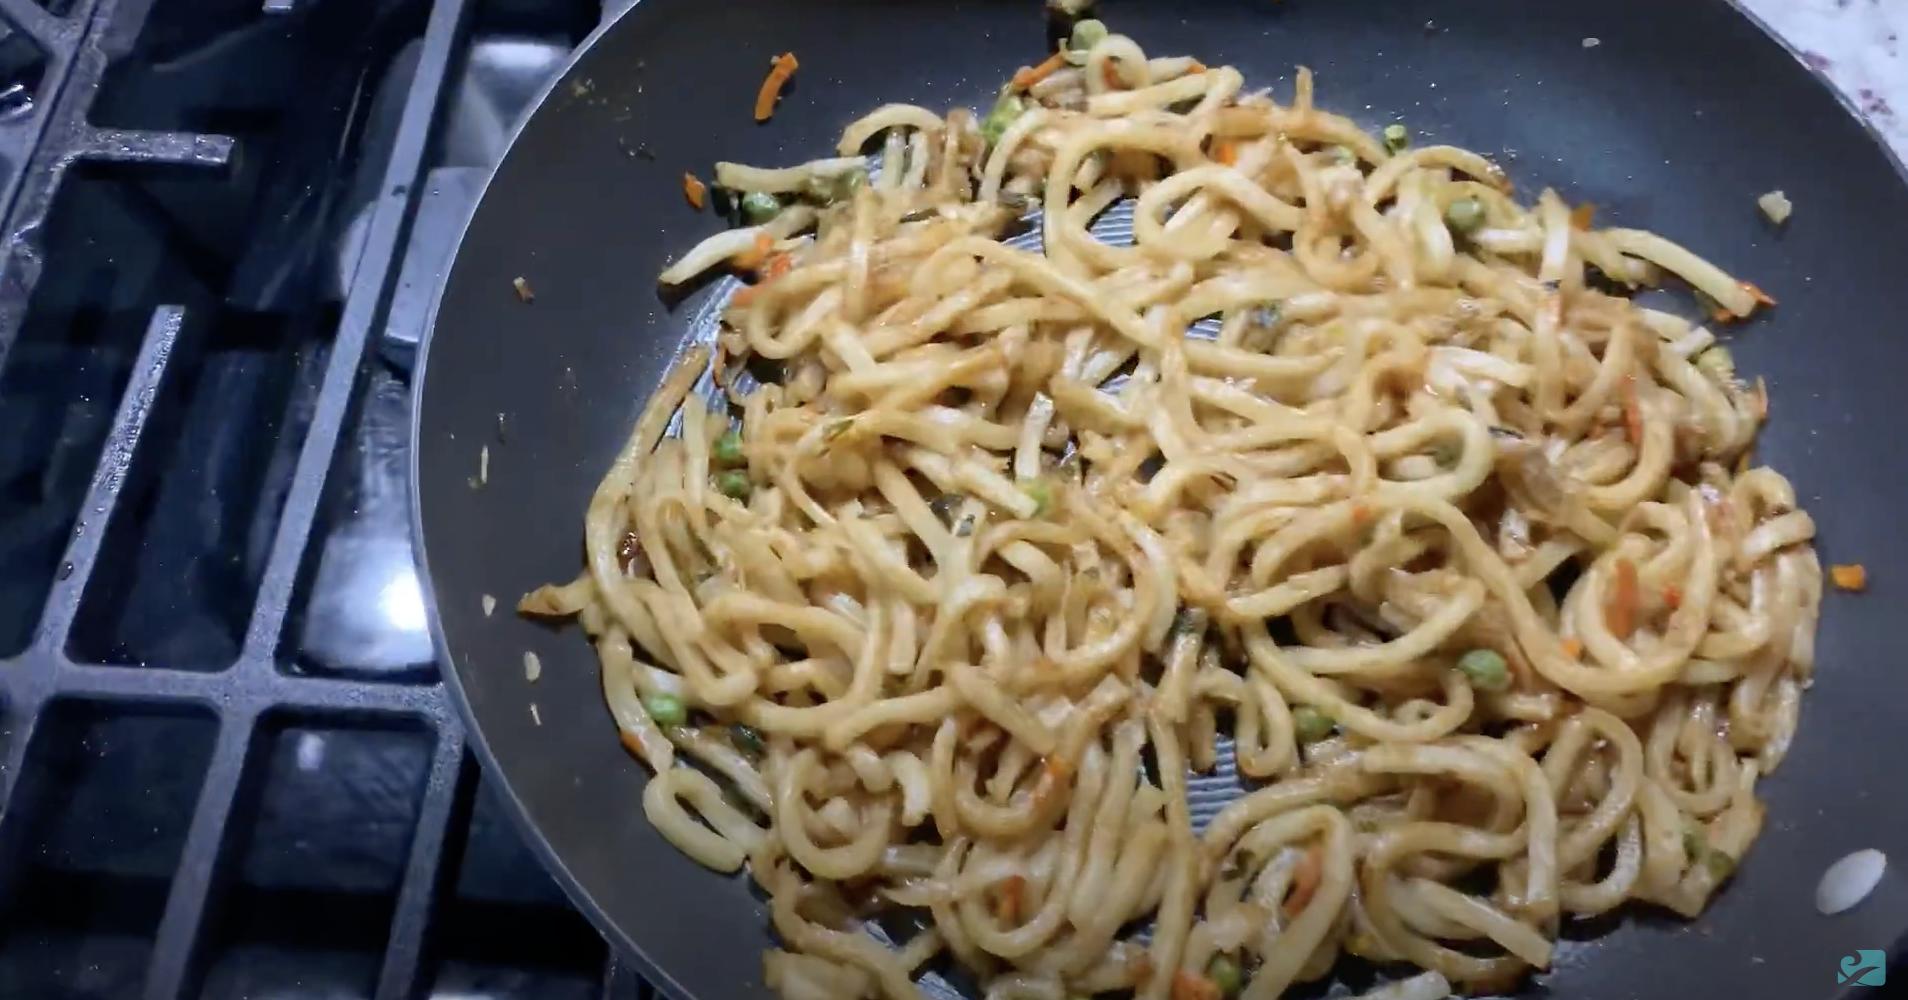 Costco's Teriyaki Udon Stir-Fry cooking in a pan.